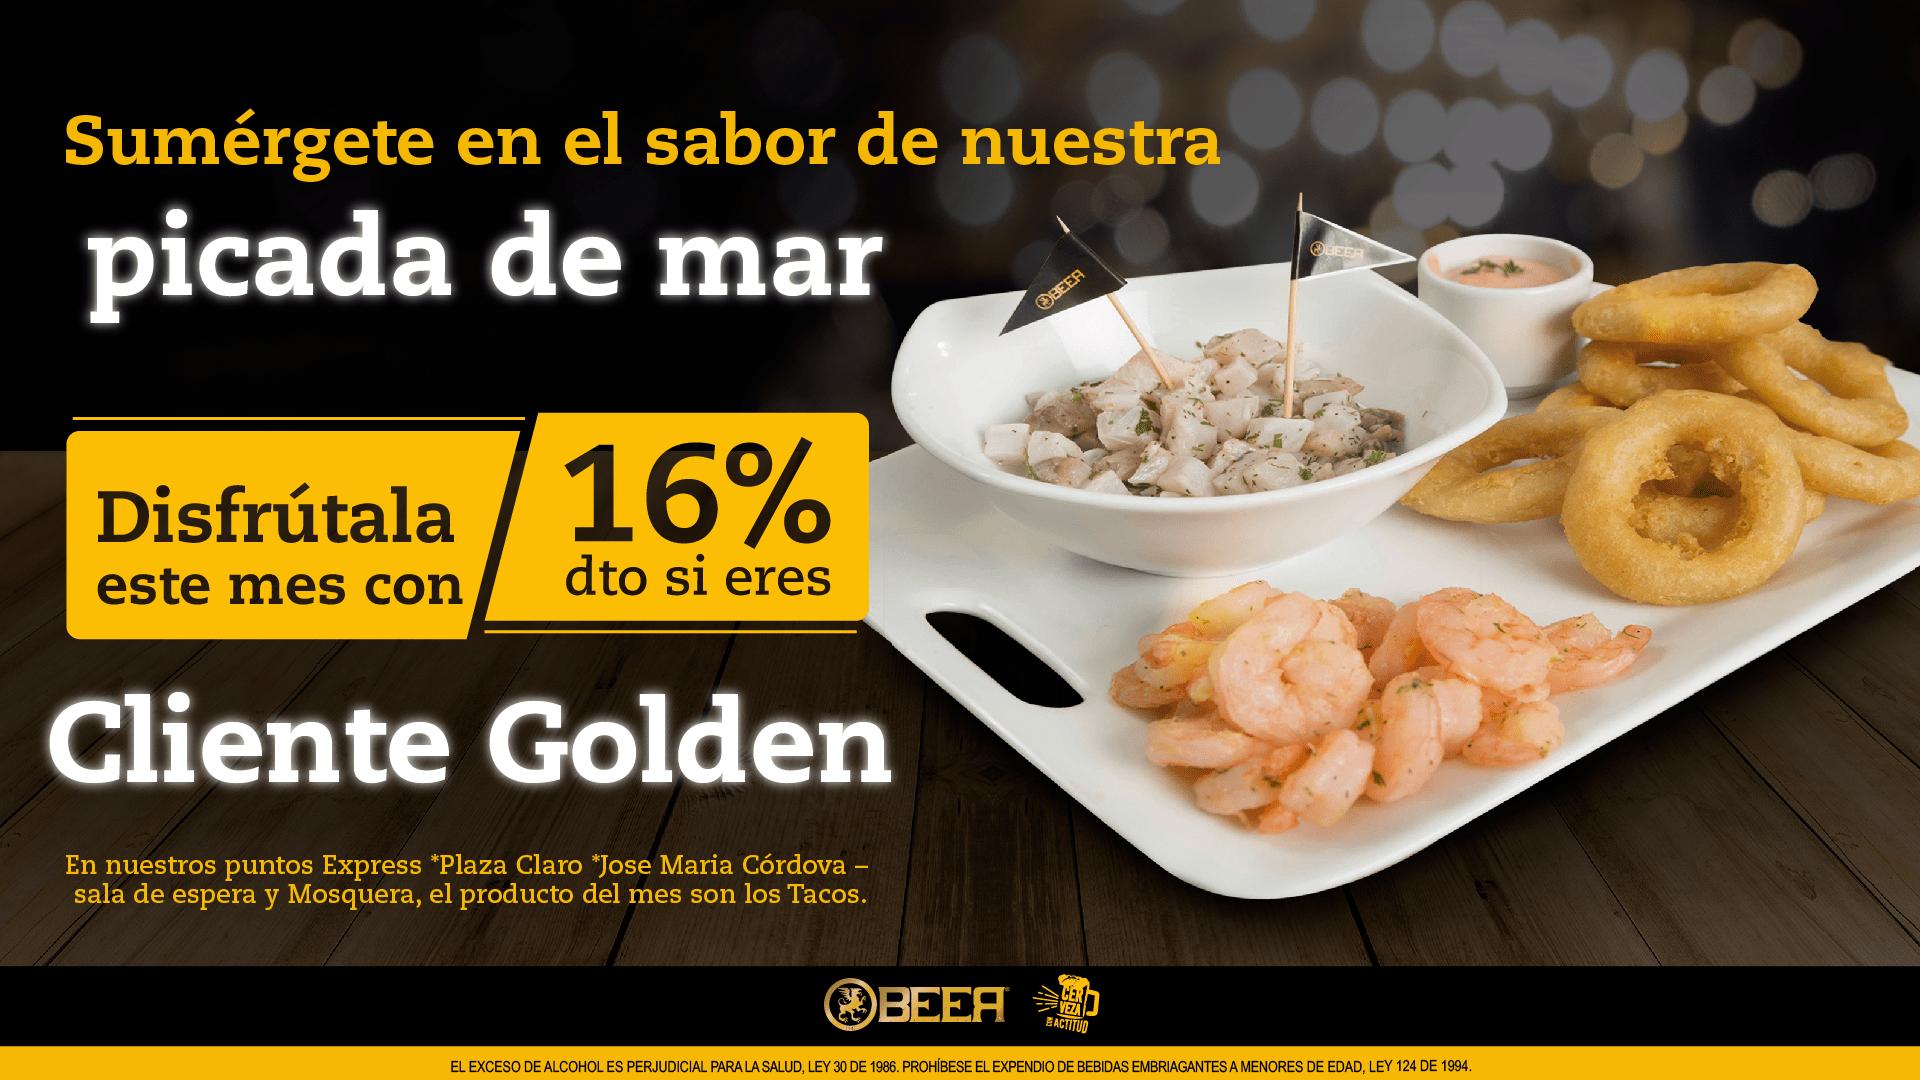 clientes golden pub beer.png